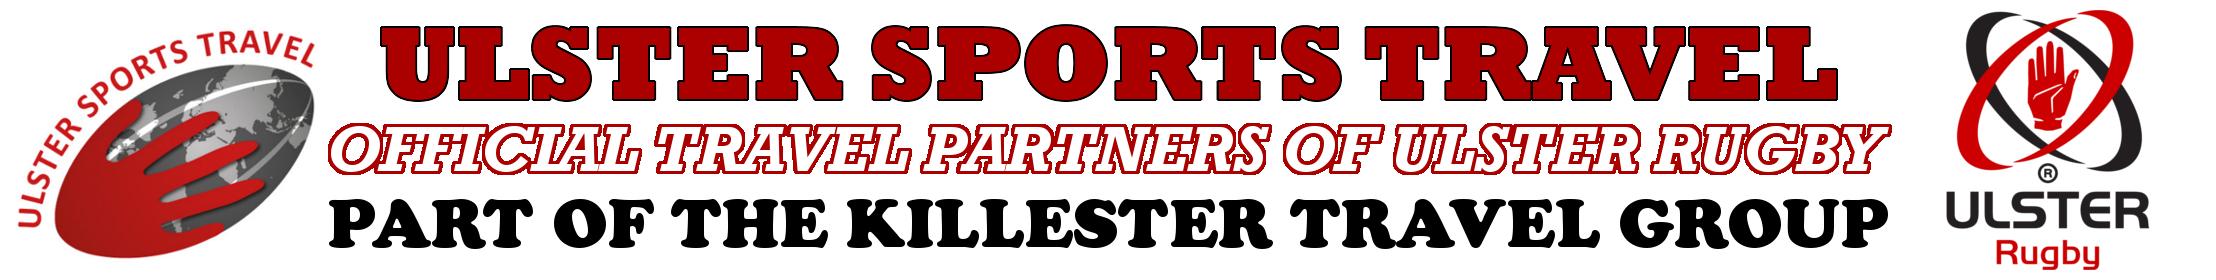 UlsterOfficialTravelPartnersust